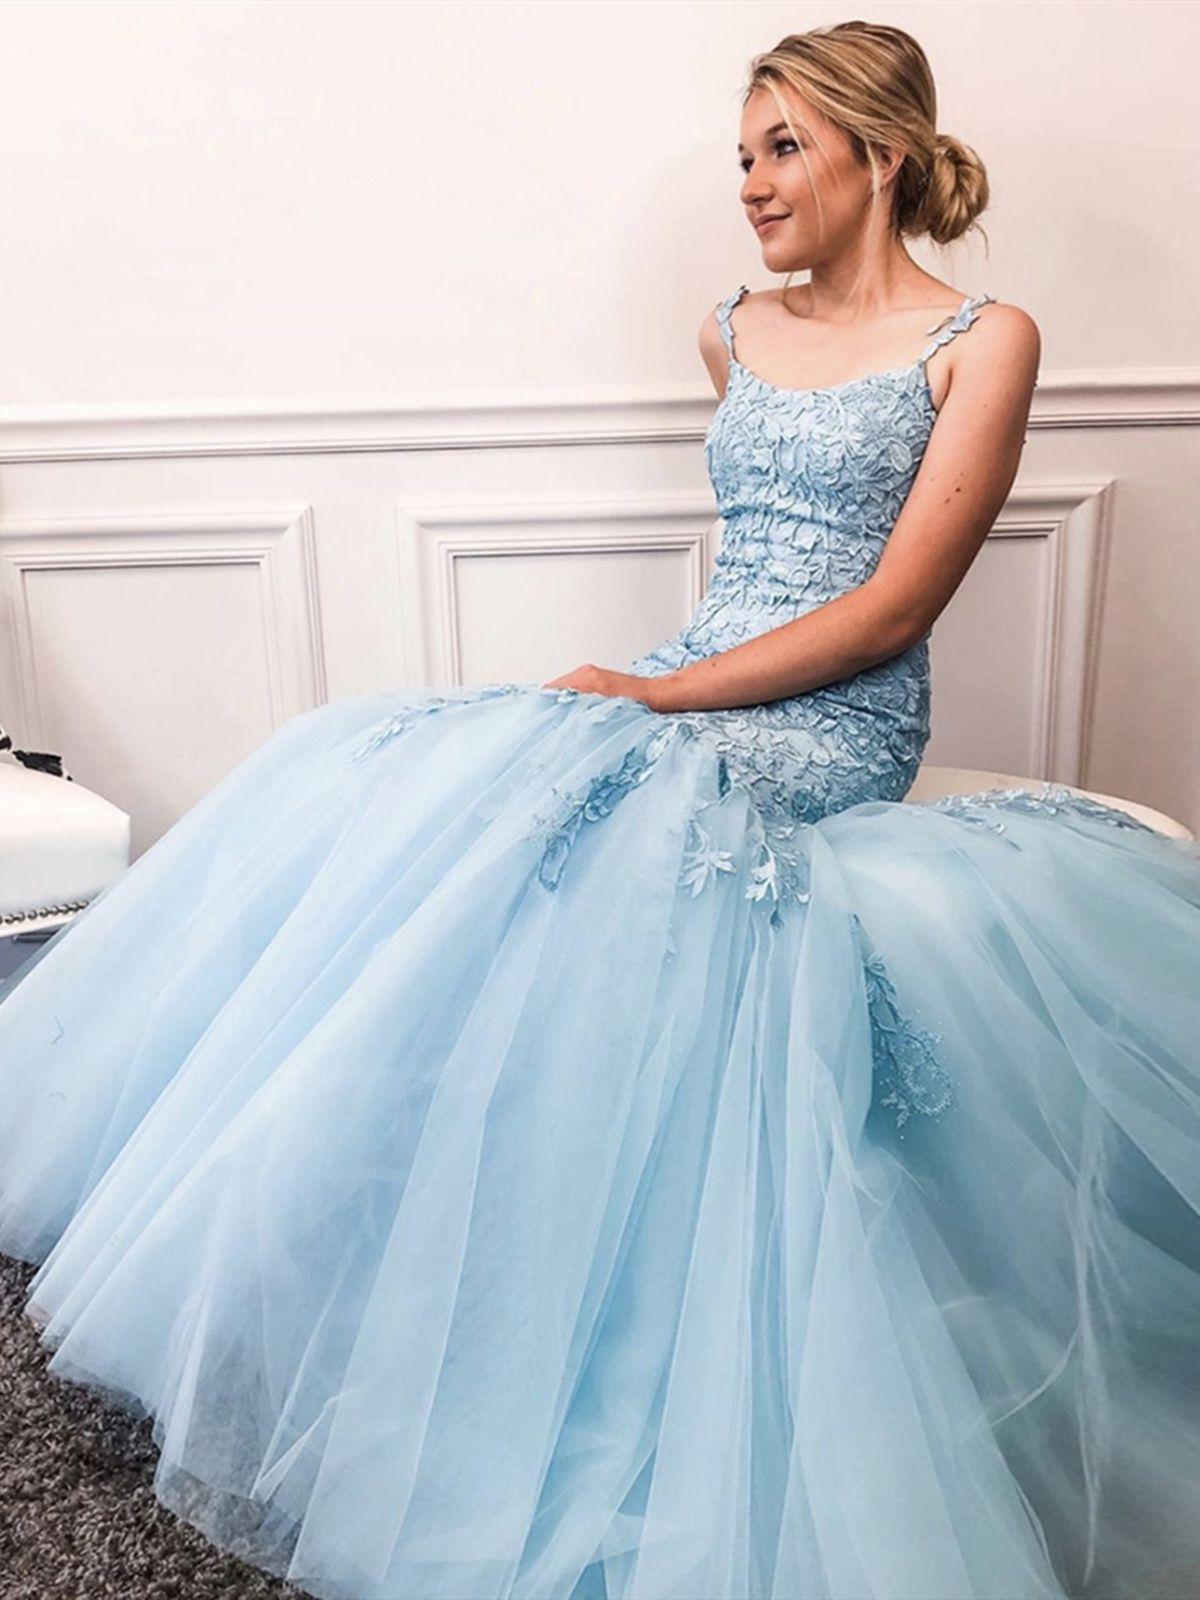 Sky Blue Mermaid Lace Prom Dresses Blue Mermaid Lace Formal Evening Dresses Blue Dress Formal Lilac Prom Dresses Light Blue Dress Formal [ 1600 x 1200 Pixel ]